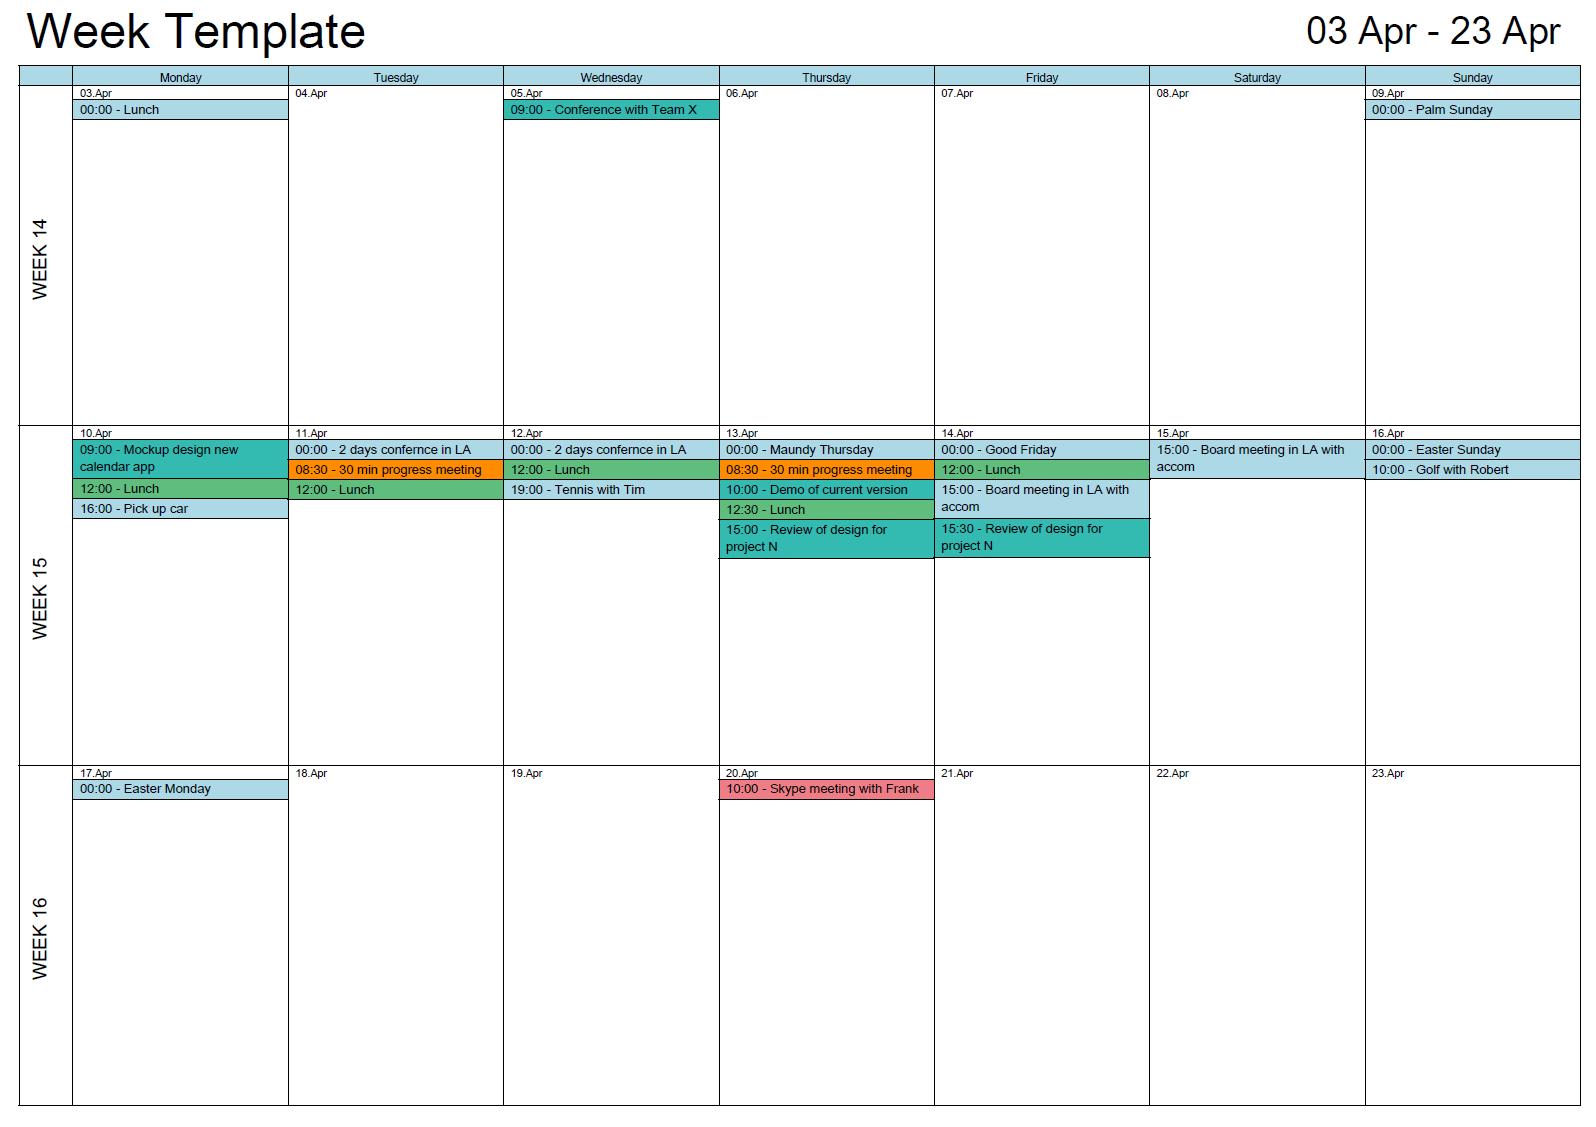 Print Calendar View Outlook | Calendar Printables Free inside Print Yearly Calendar Outlook